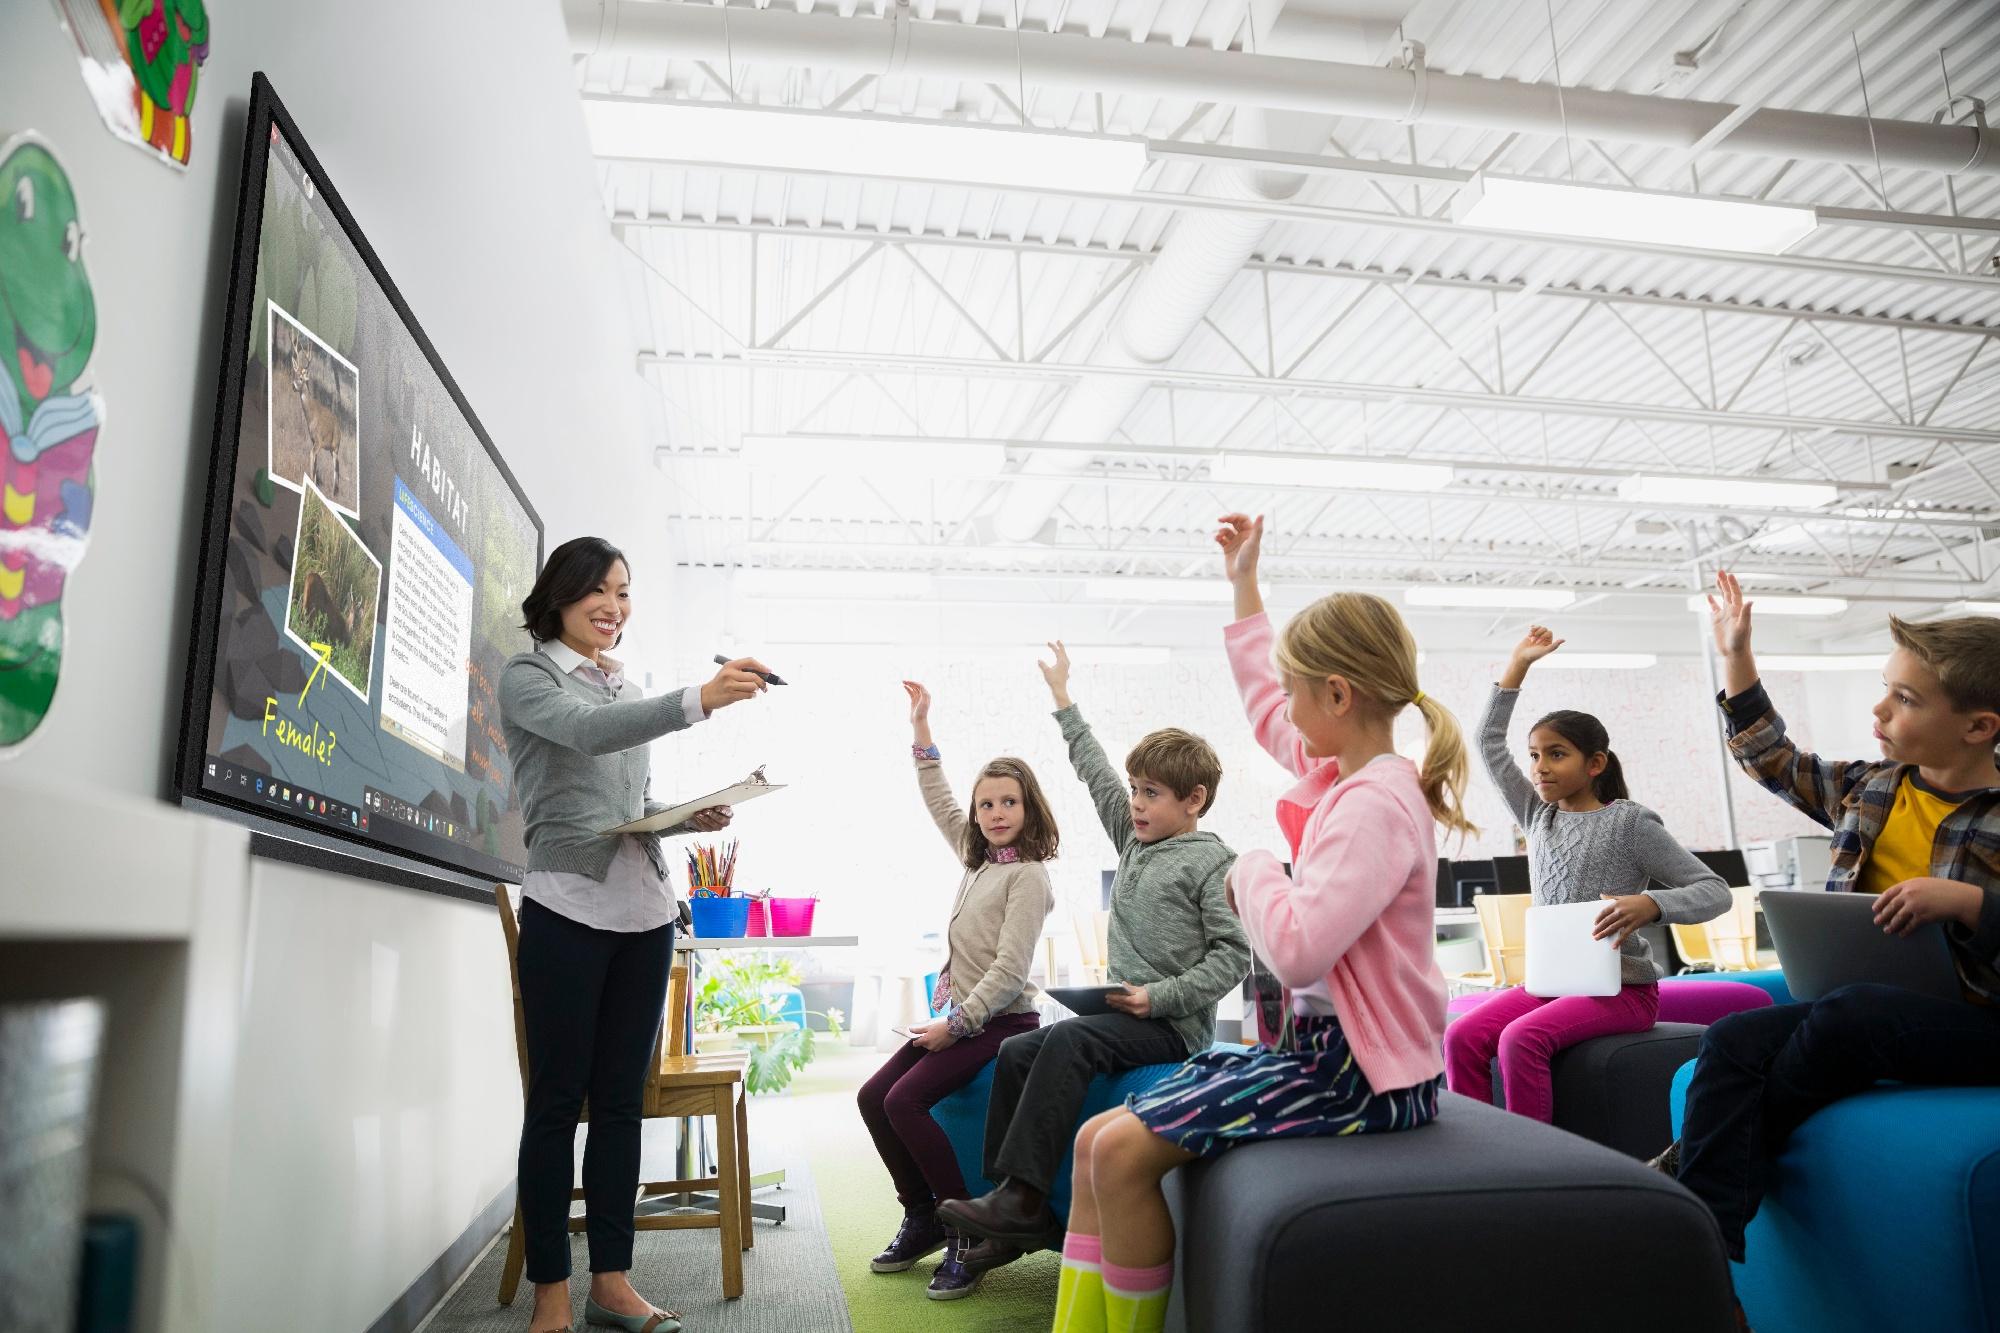 smart-education-bee-smart-city-viewsonic-classroom